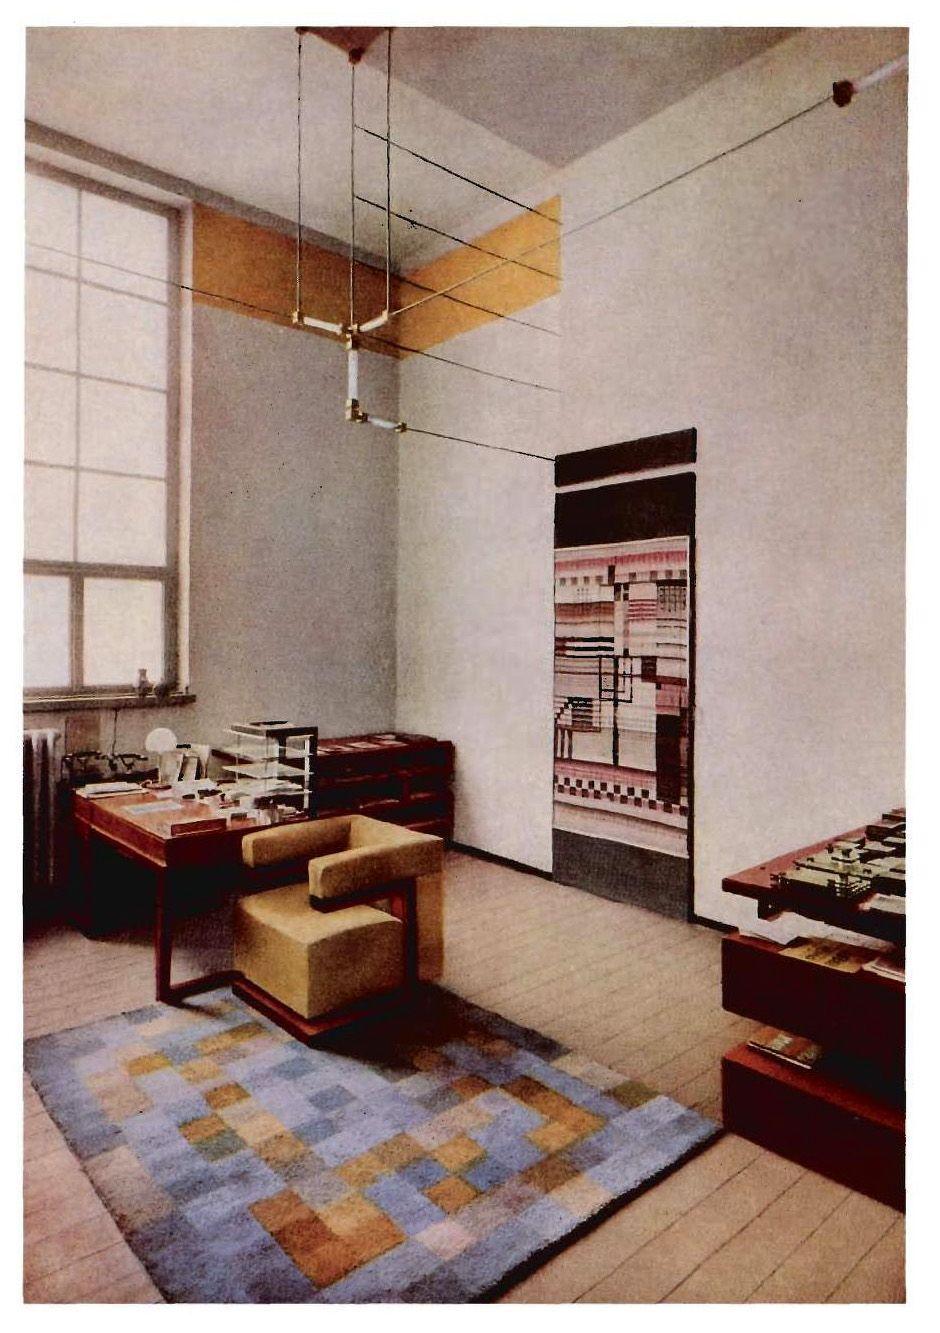 Inside Gropius S Director S Office At The Bauhaus Dessau